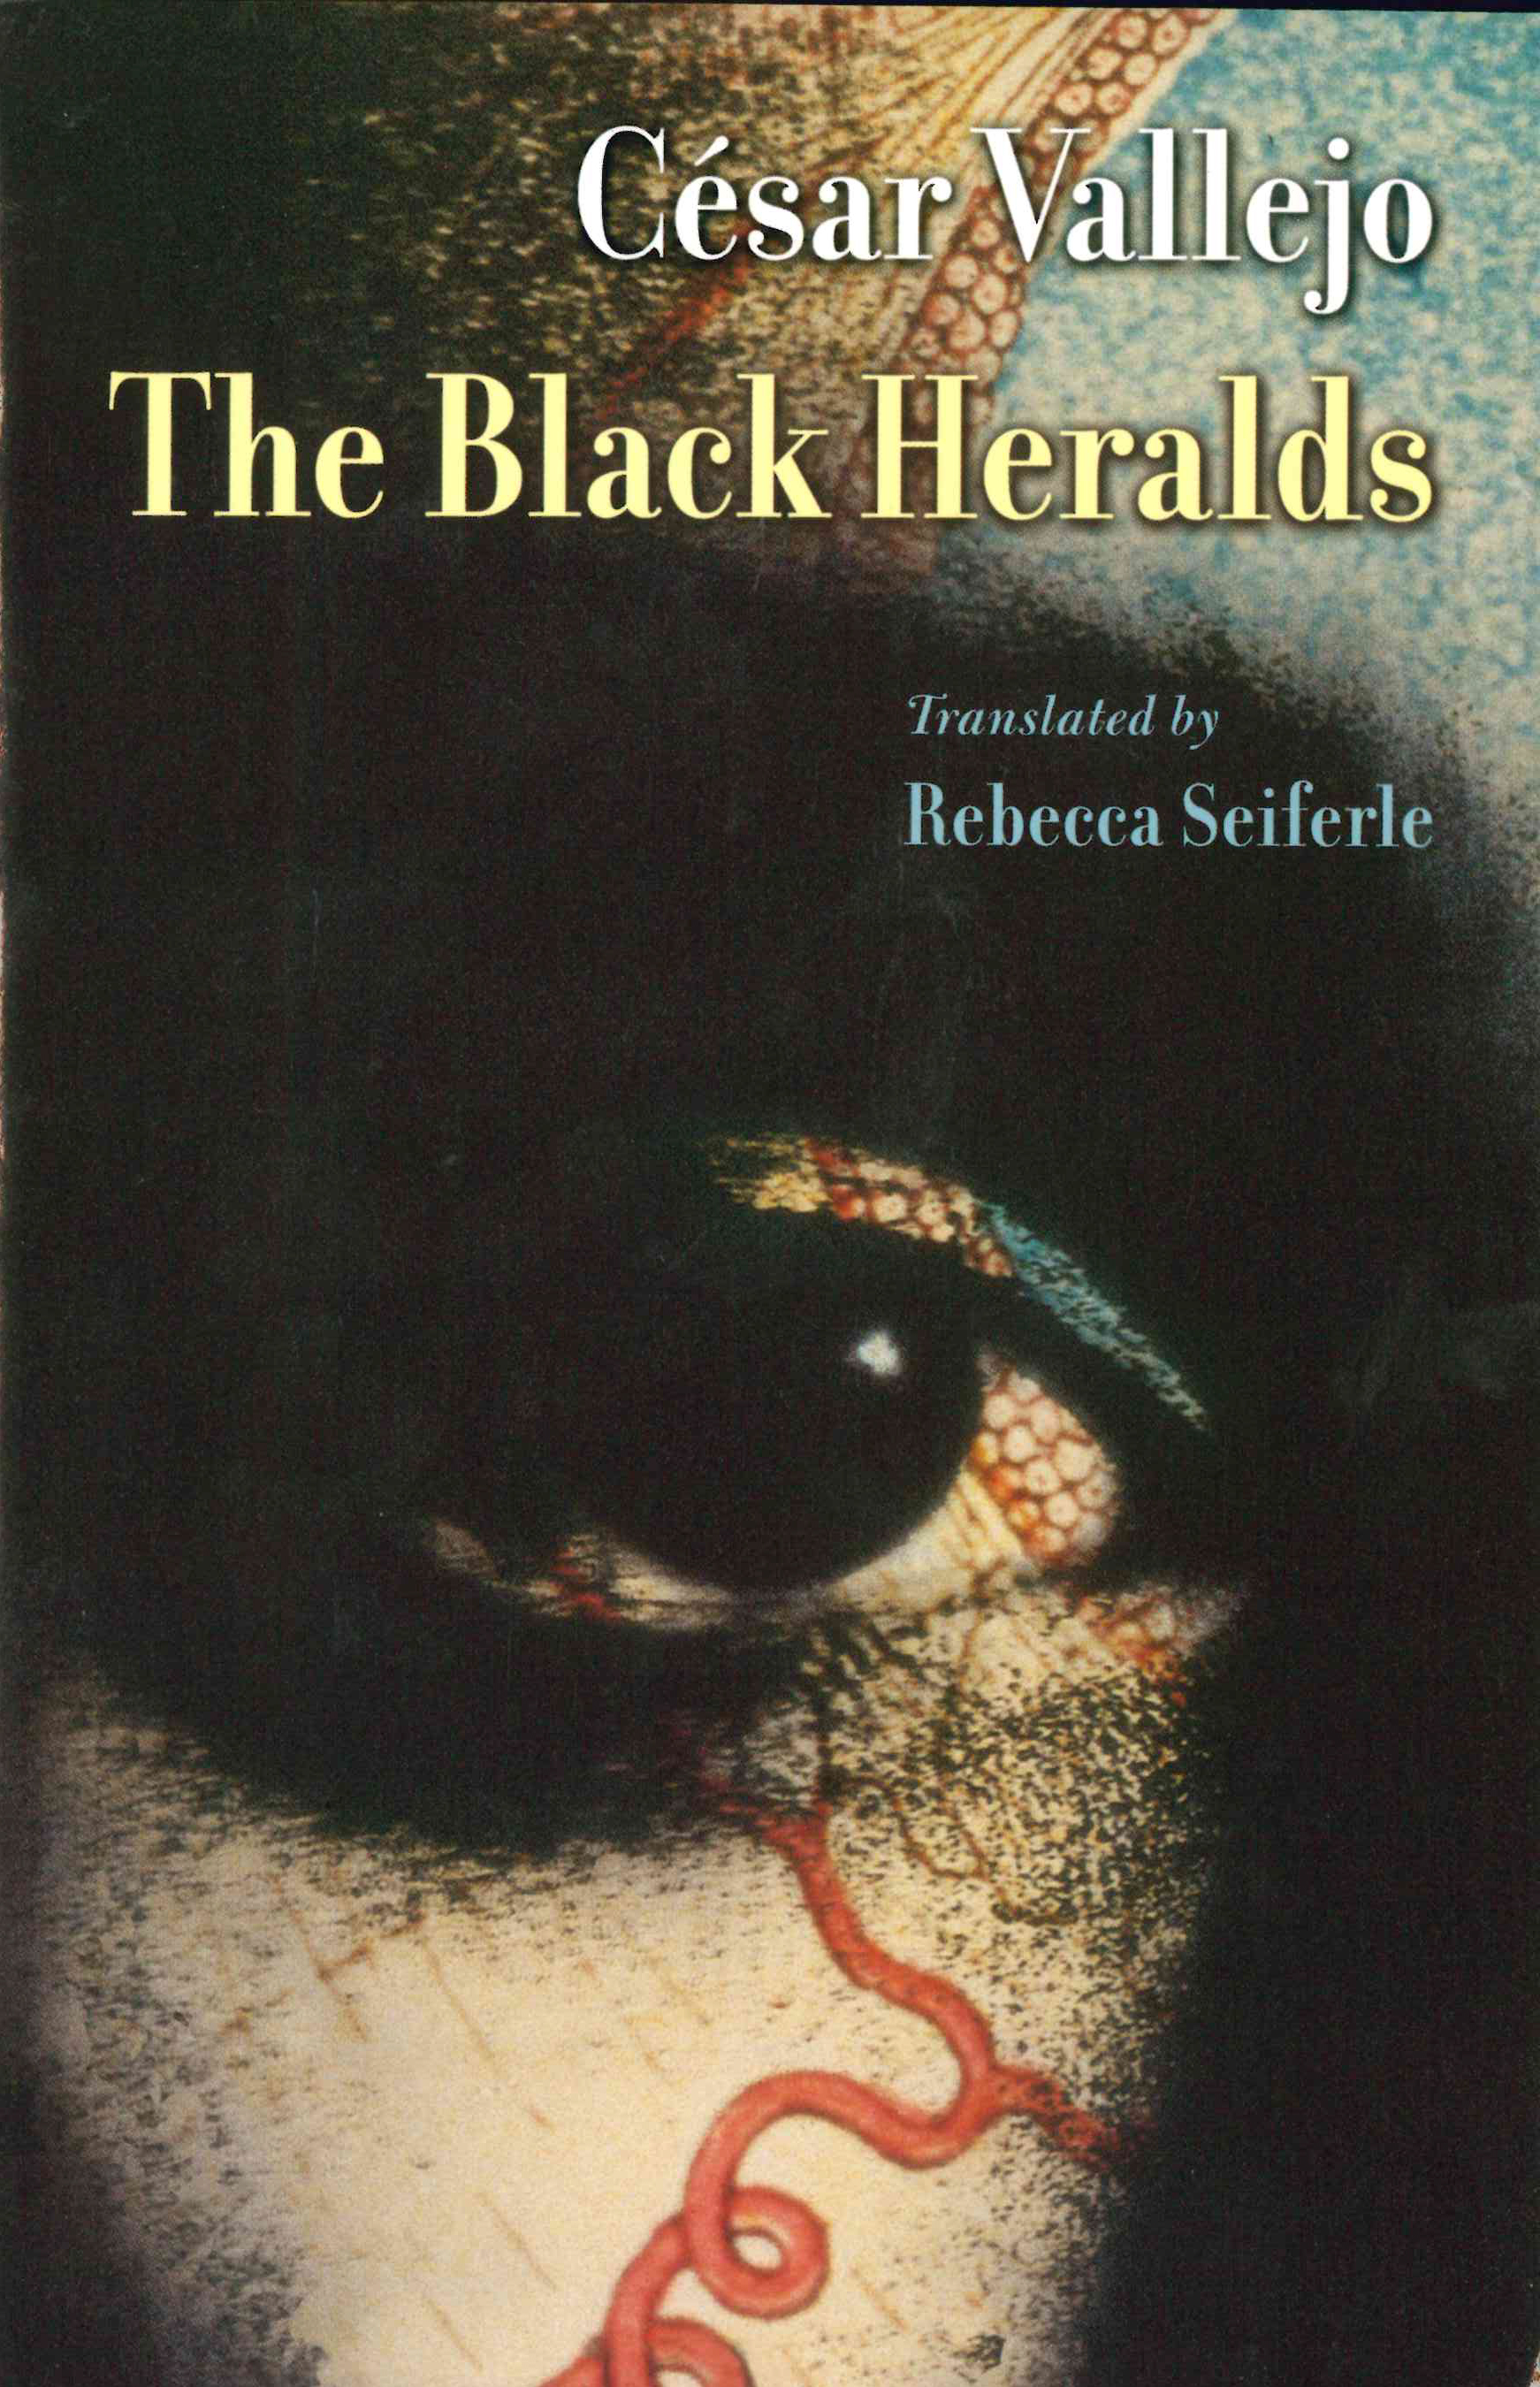 Black Heralds